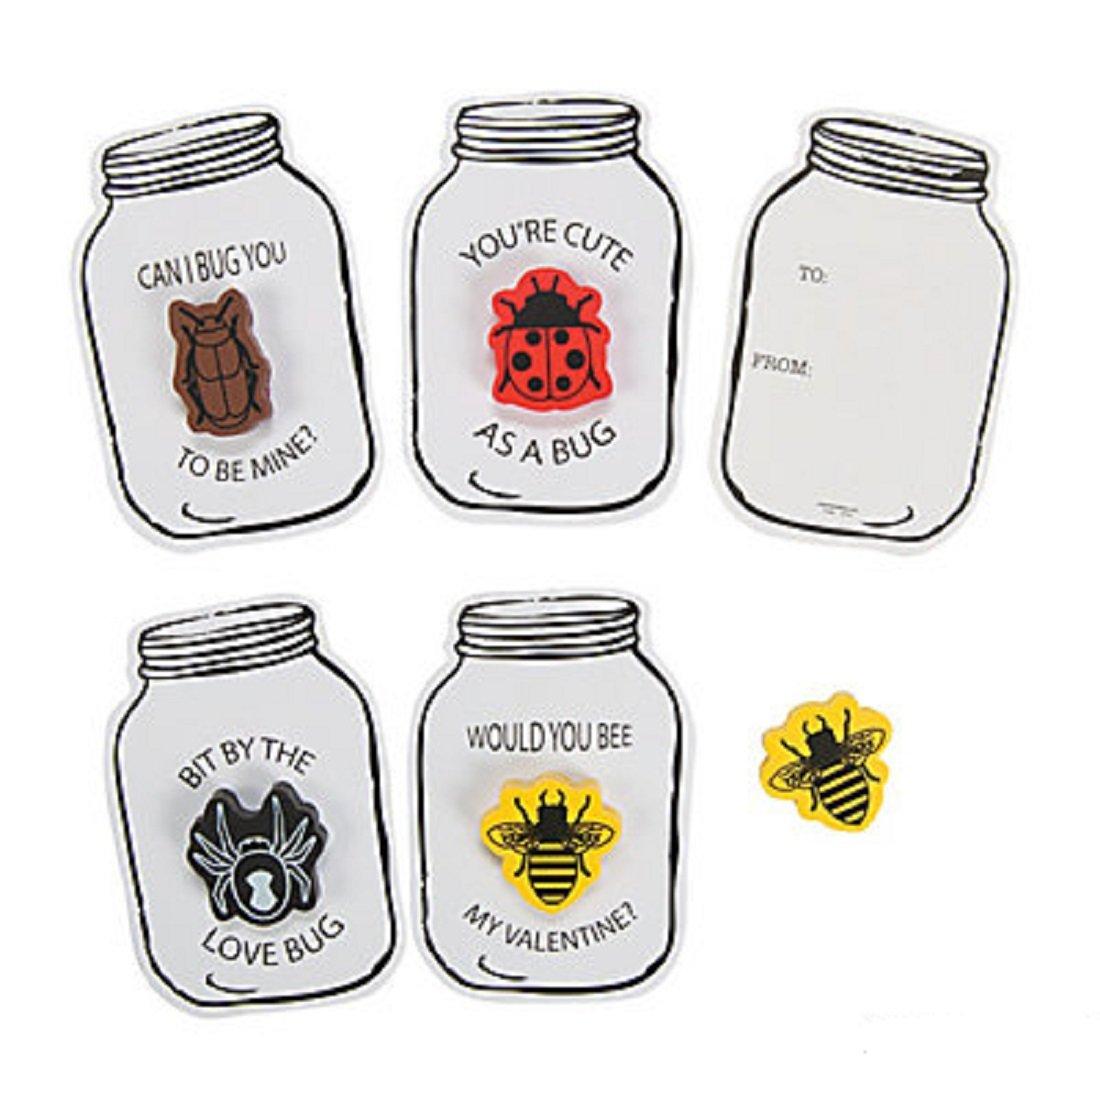 Bug Jar Eraser Valentine Cards with Cute Erasers